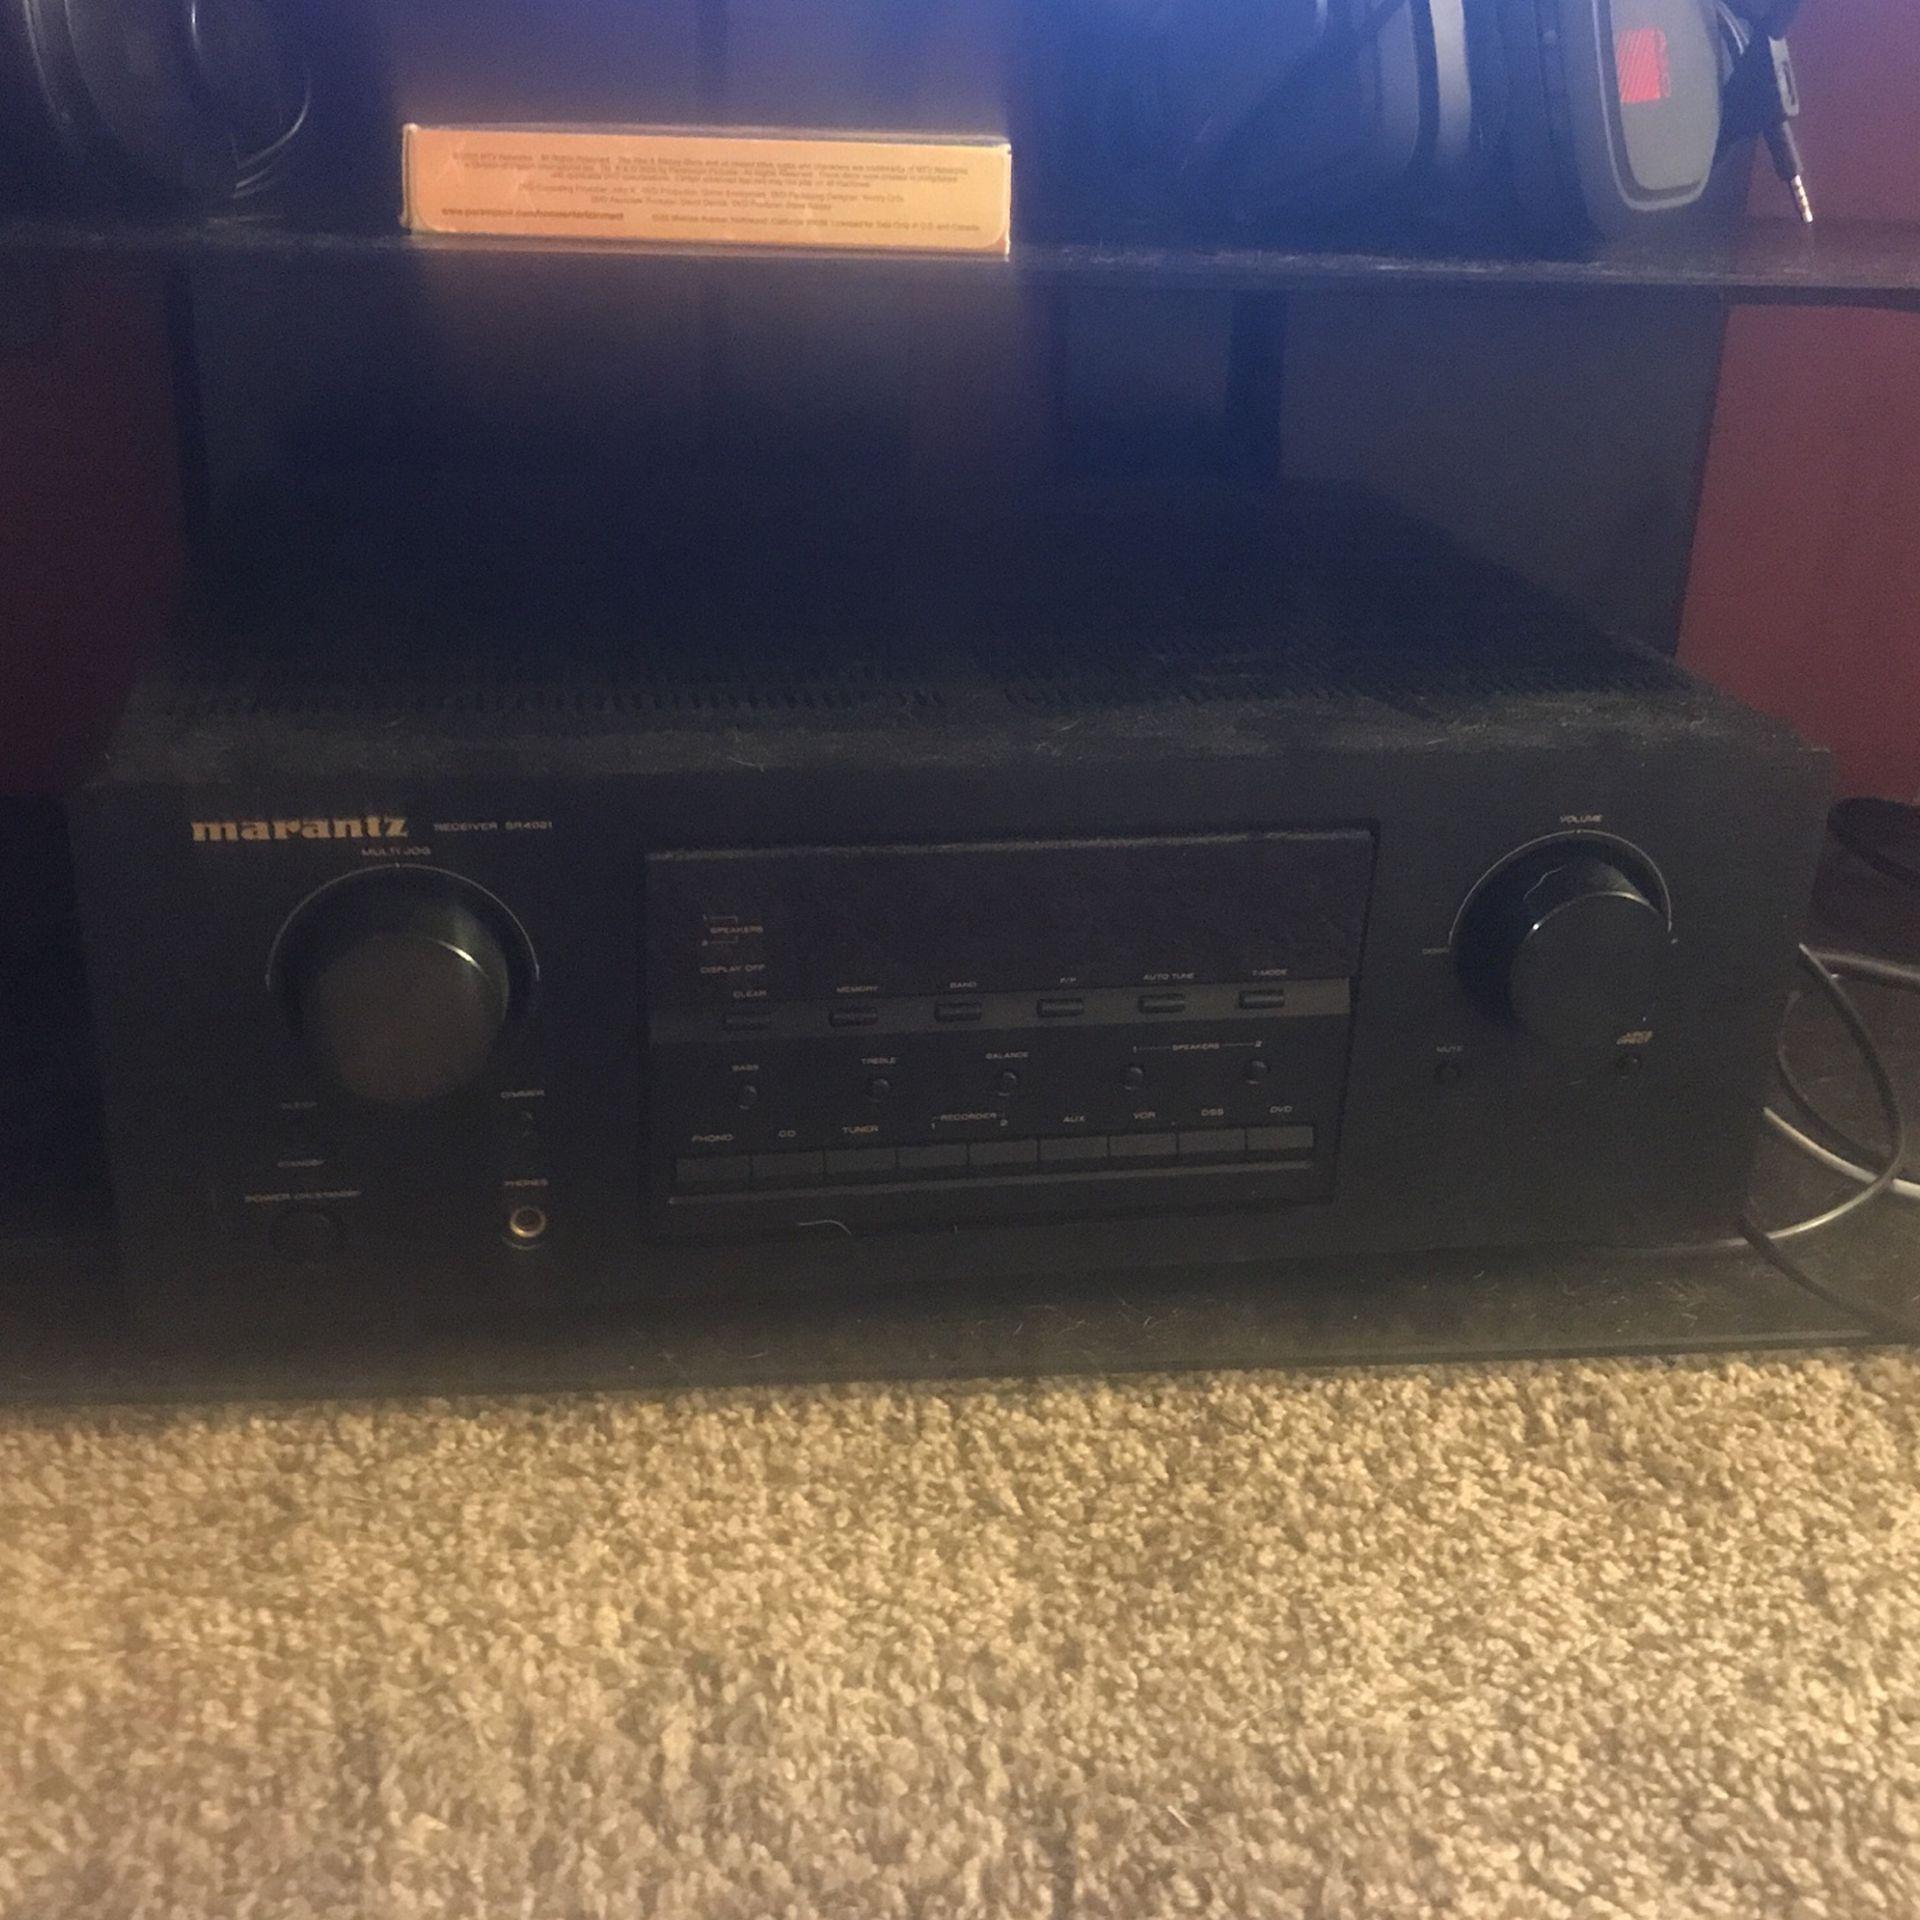 Marantz Sr4021 Am/fm Stereo 2-channel Home Receiver